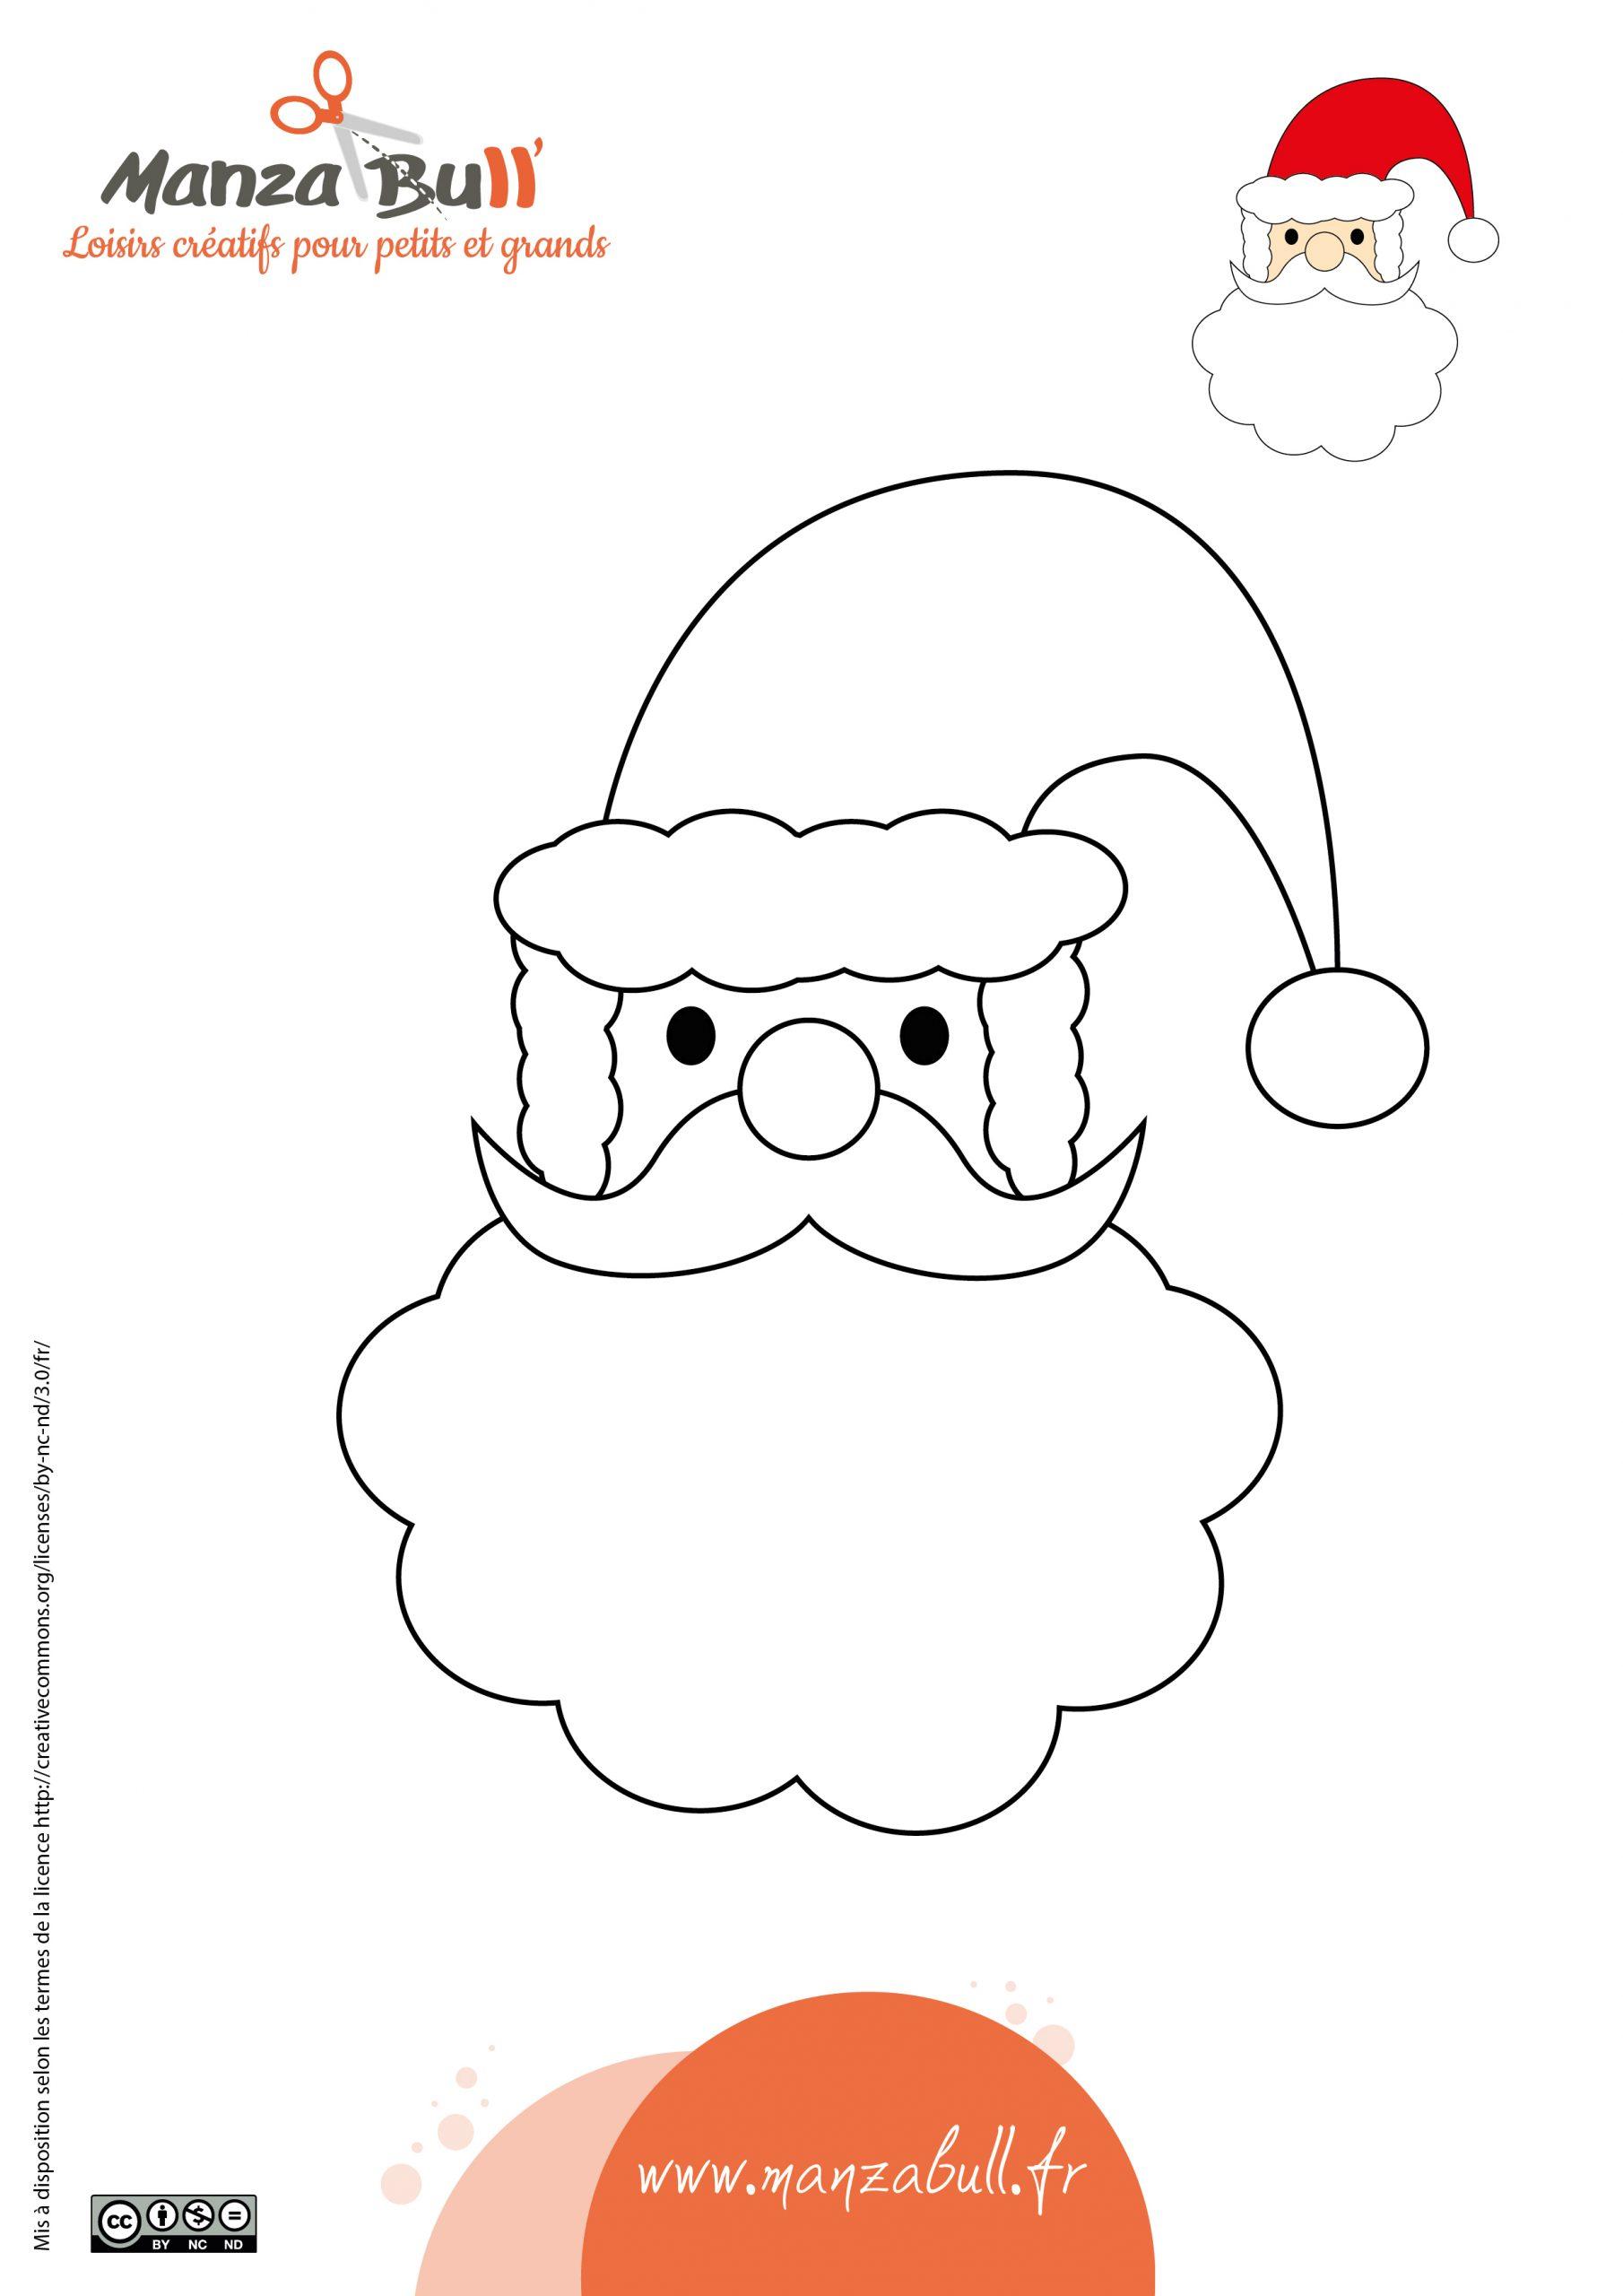 Coloriage Père Noël À Imprimer - Manzabull' tout Dessins Pere Noel Imprimer